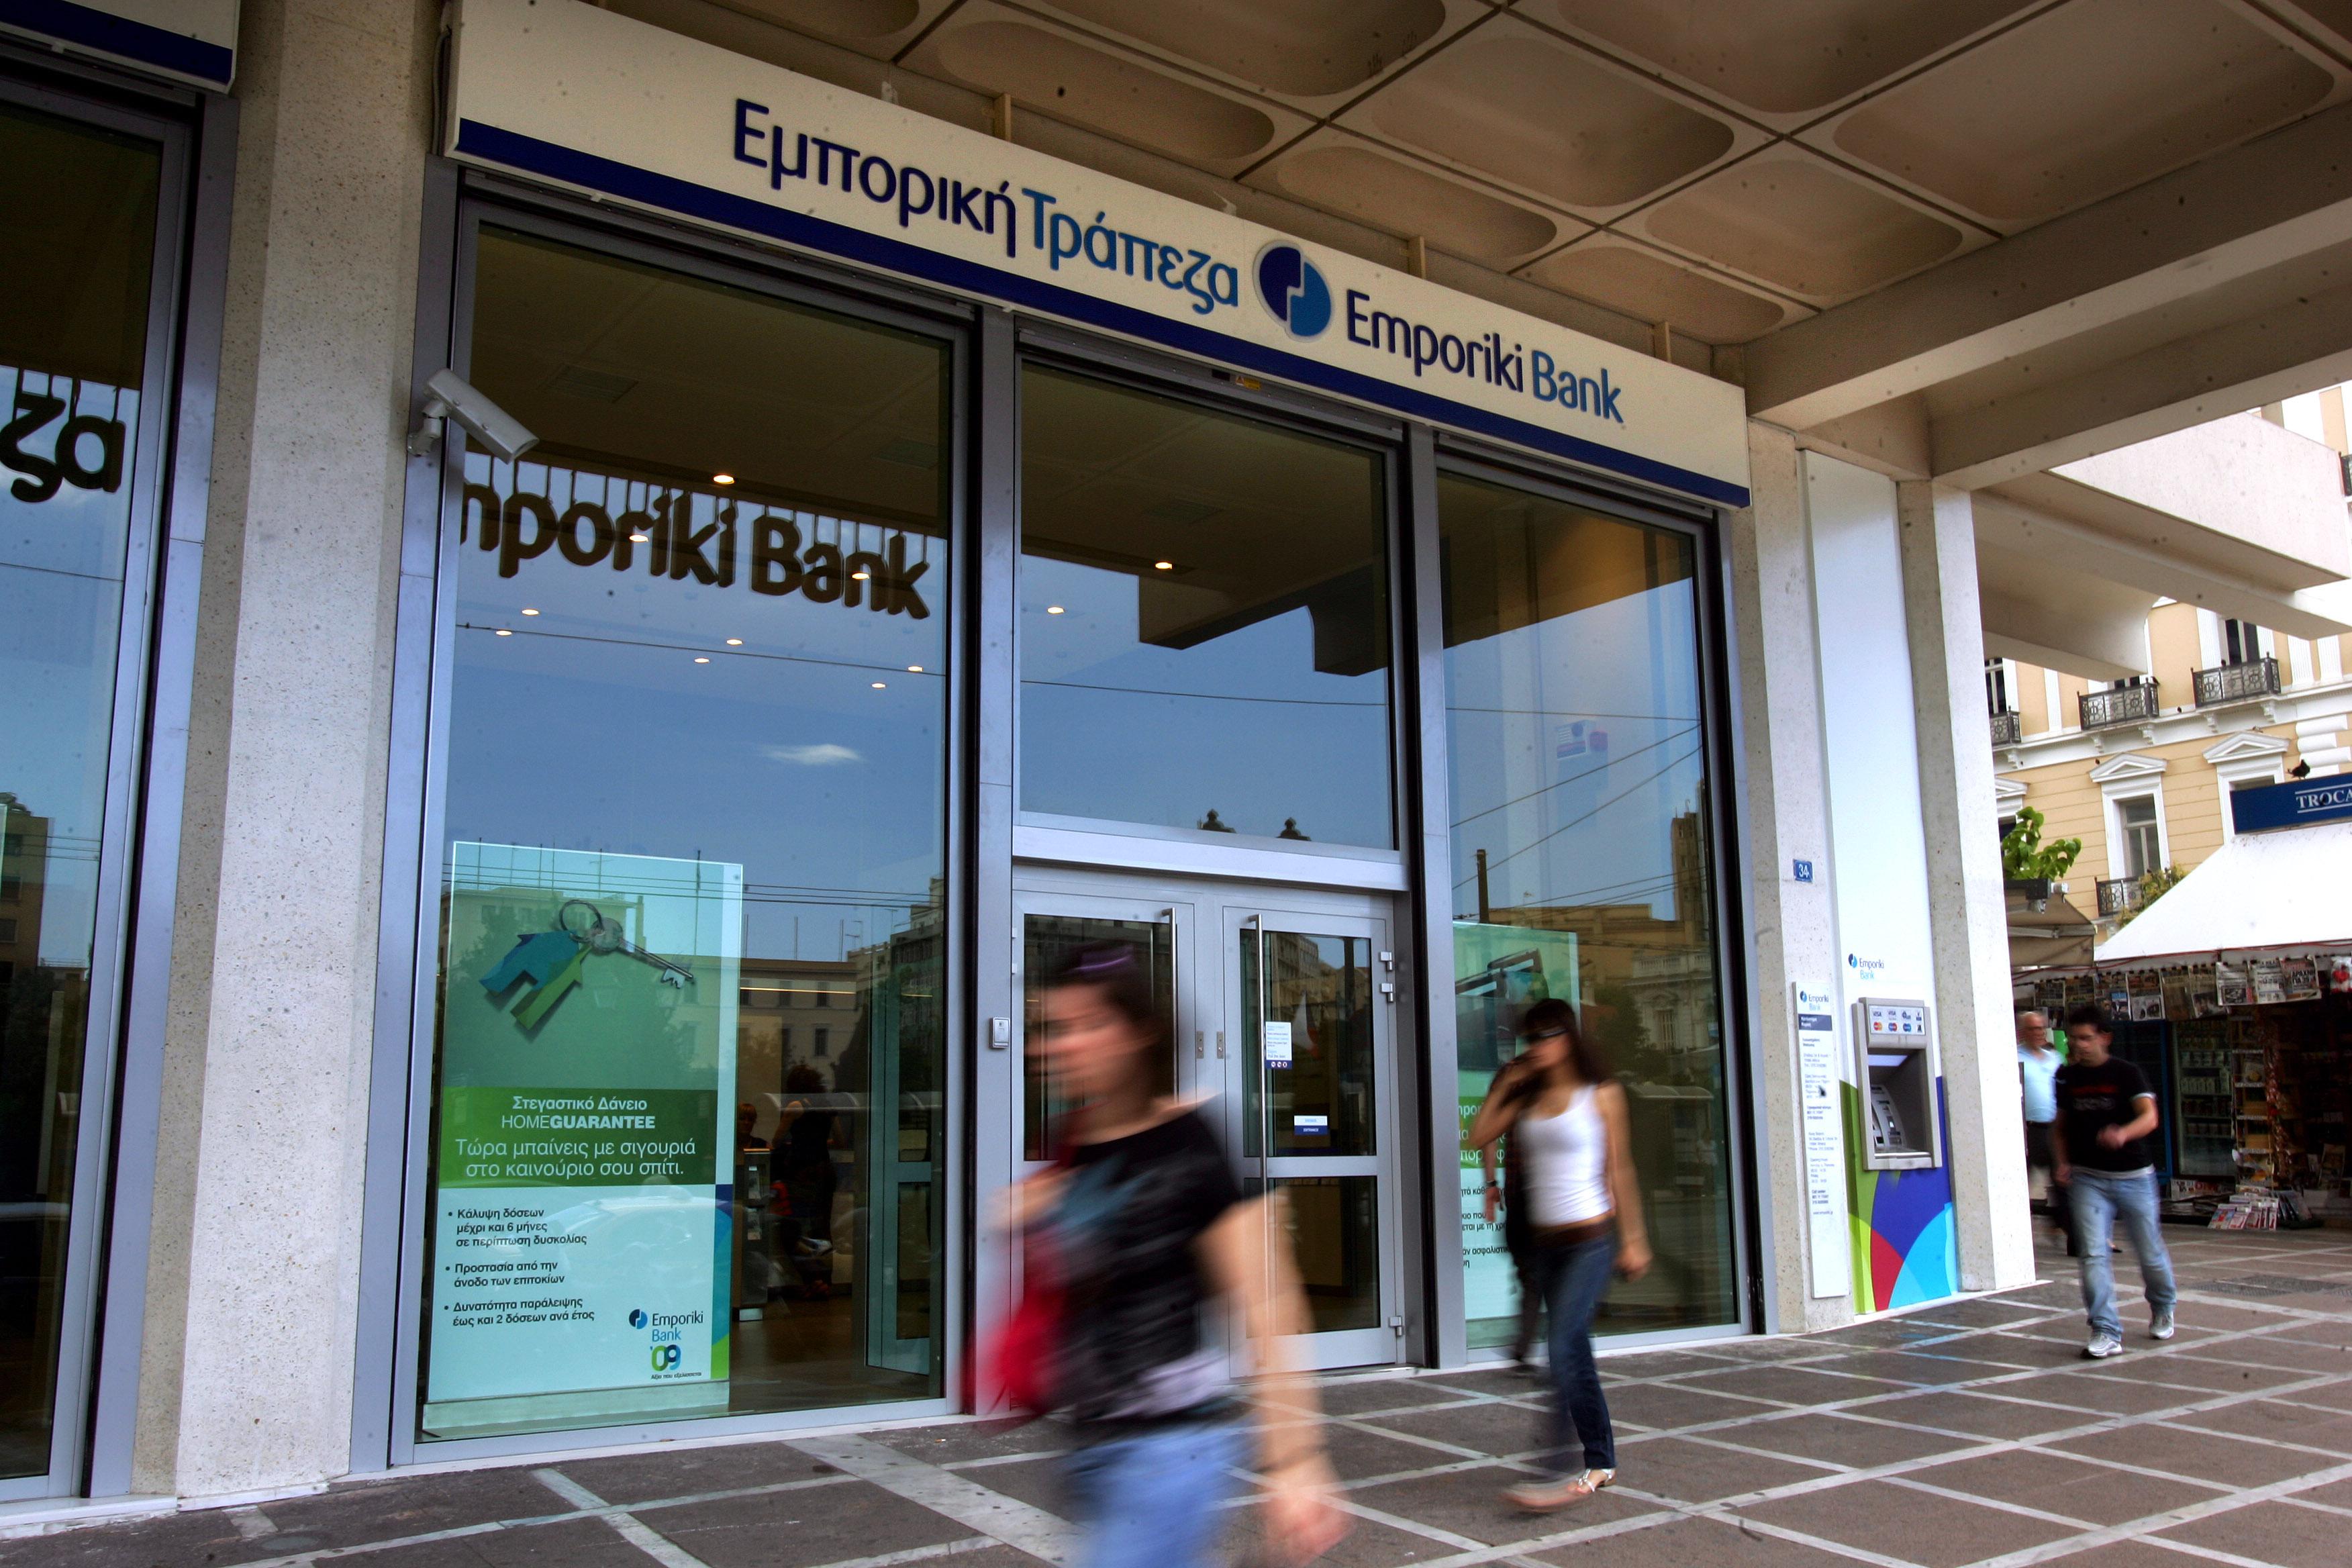 b328185e39 Νέα σειρά πιστωτικών καρτών με προνόμια υγείας και επιστροφή μετρητών στους  κατόχους τους λάνσαρε η Εμπορική Τράπεζα. Πρόκειται για το προϊόν με την ...